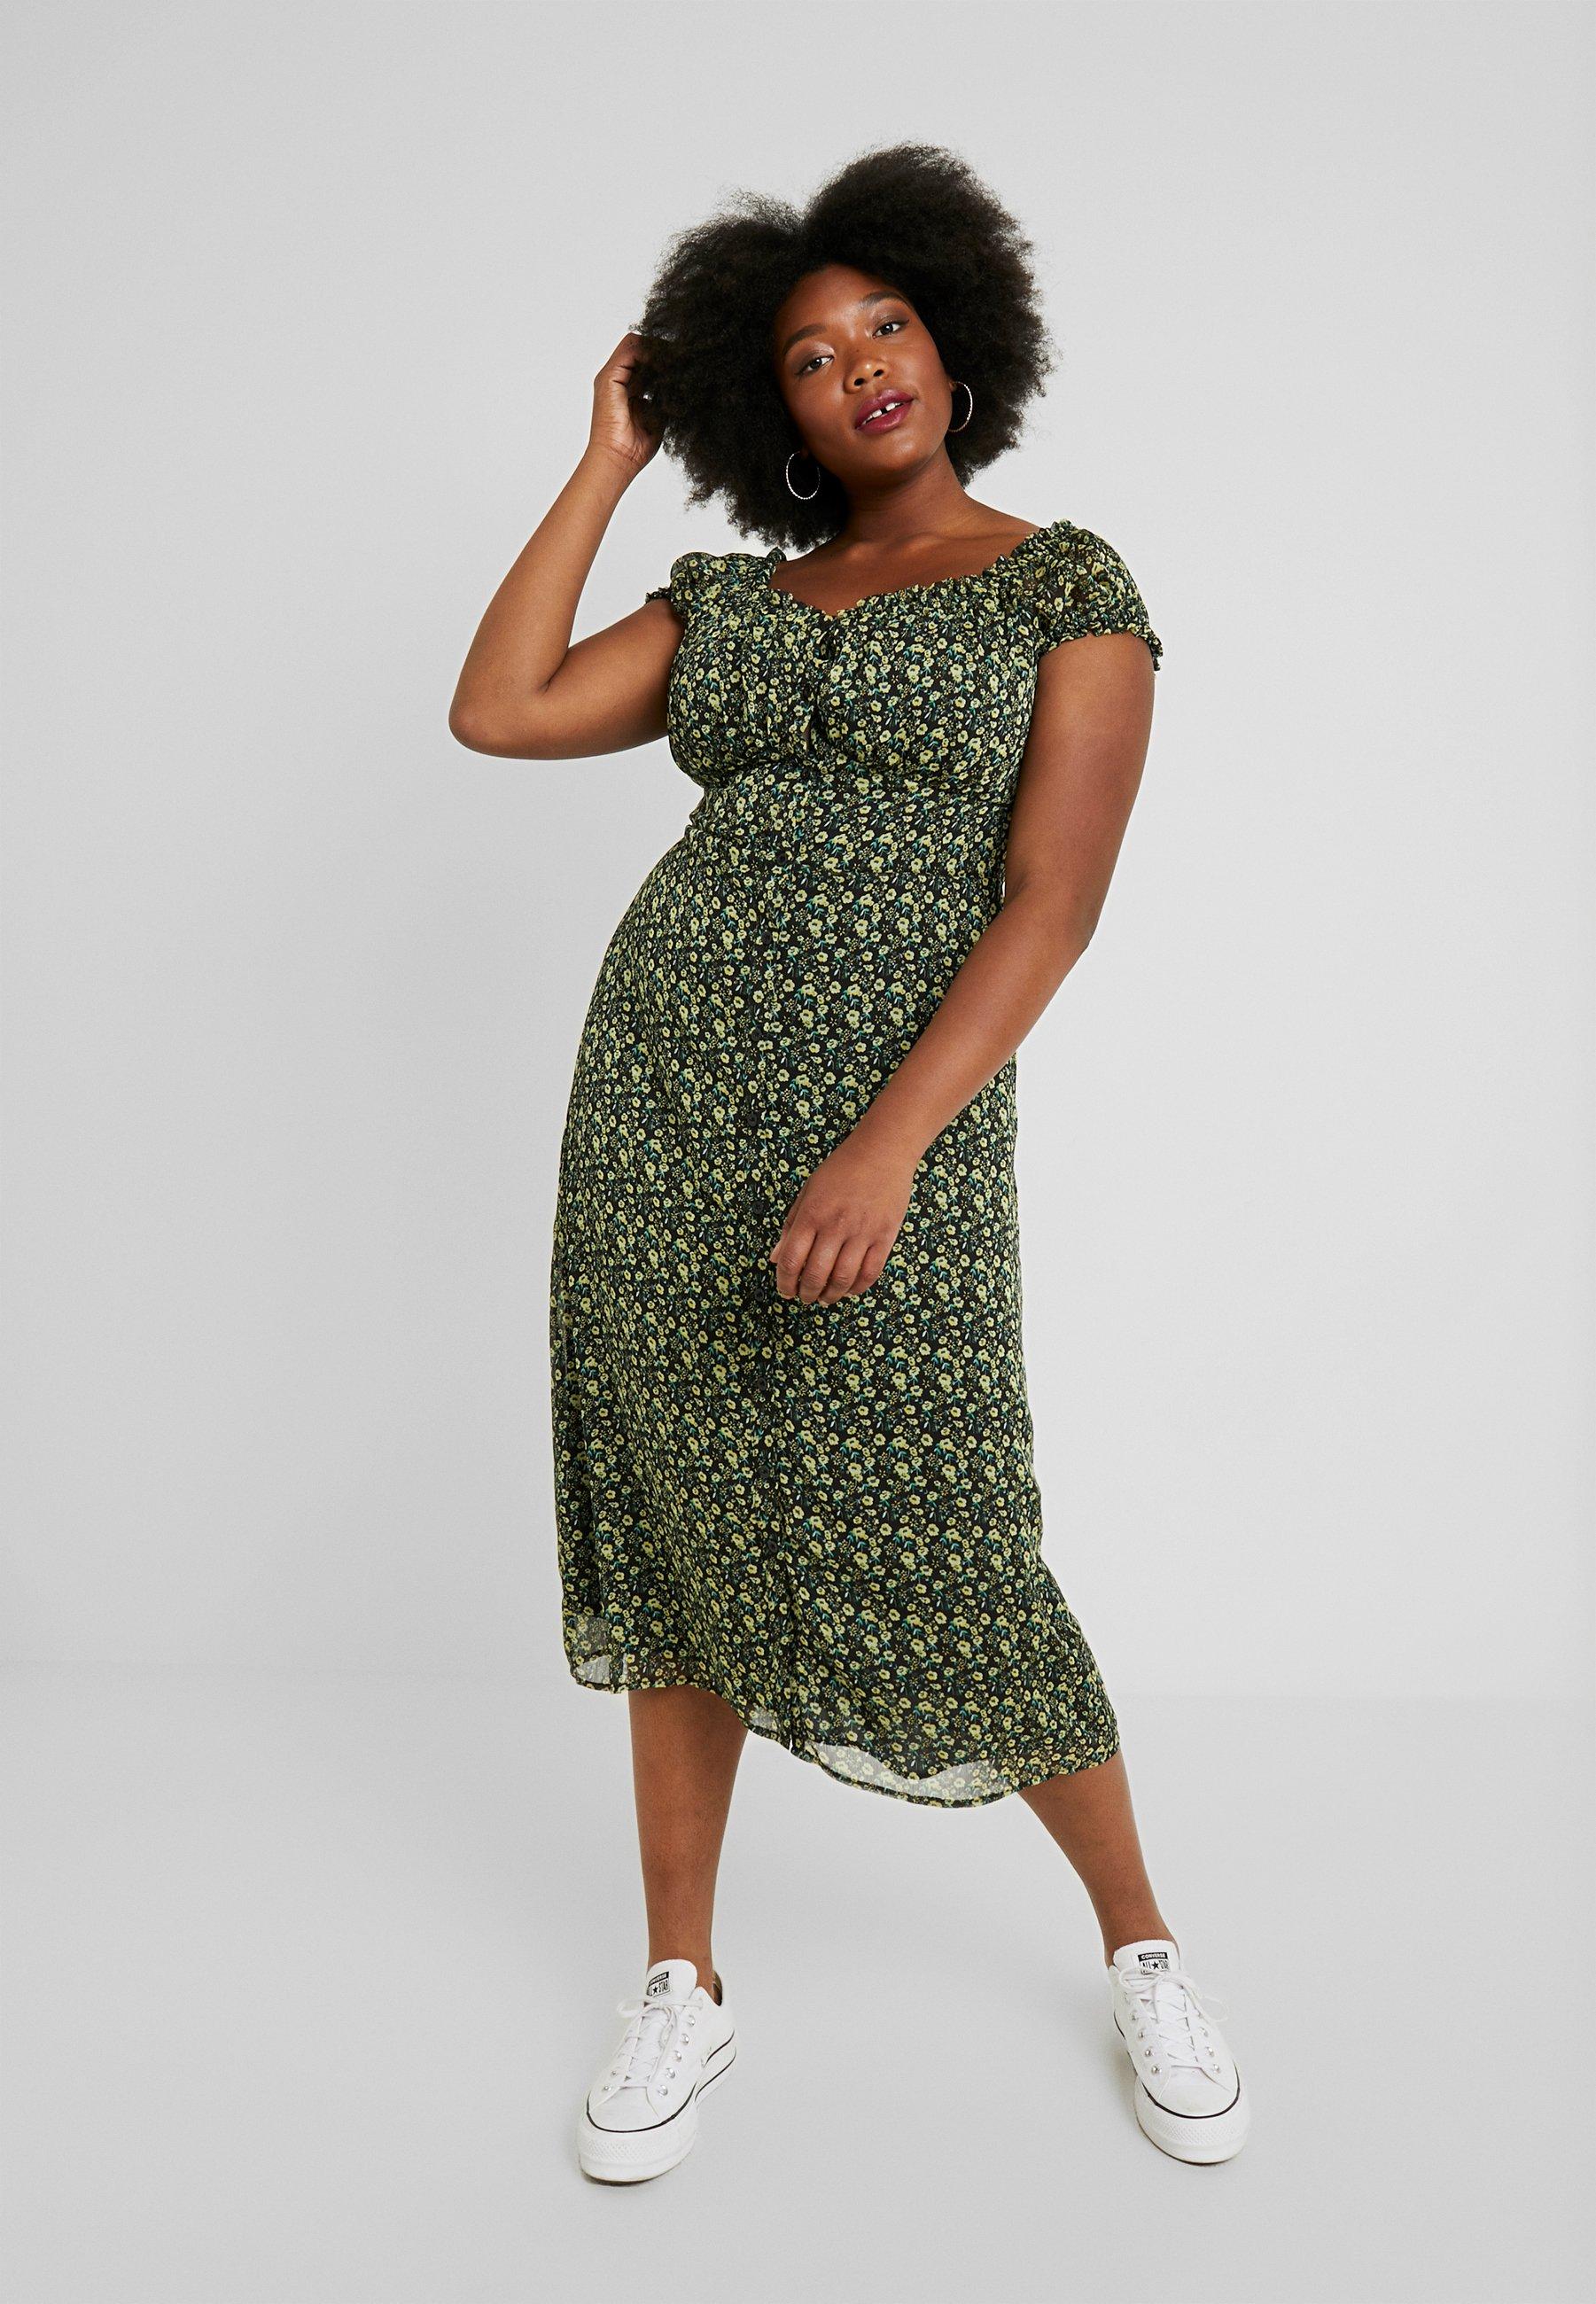 Glamorous Curve - WITH TIES VNECK DRESS - Skjortekjole - black/yellow